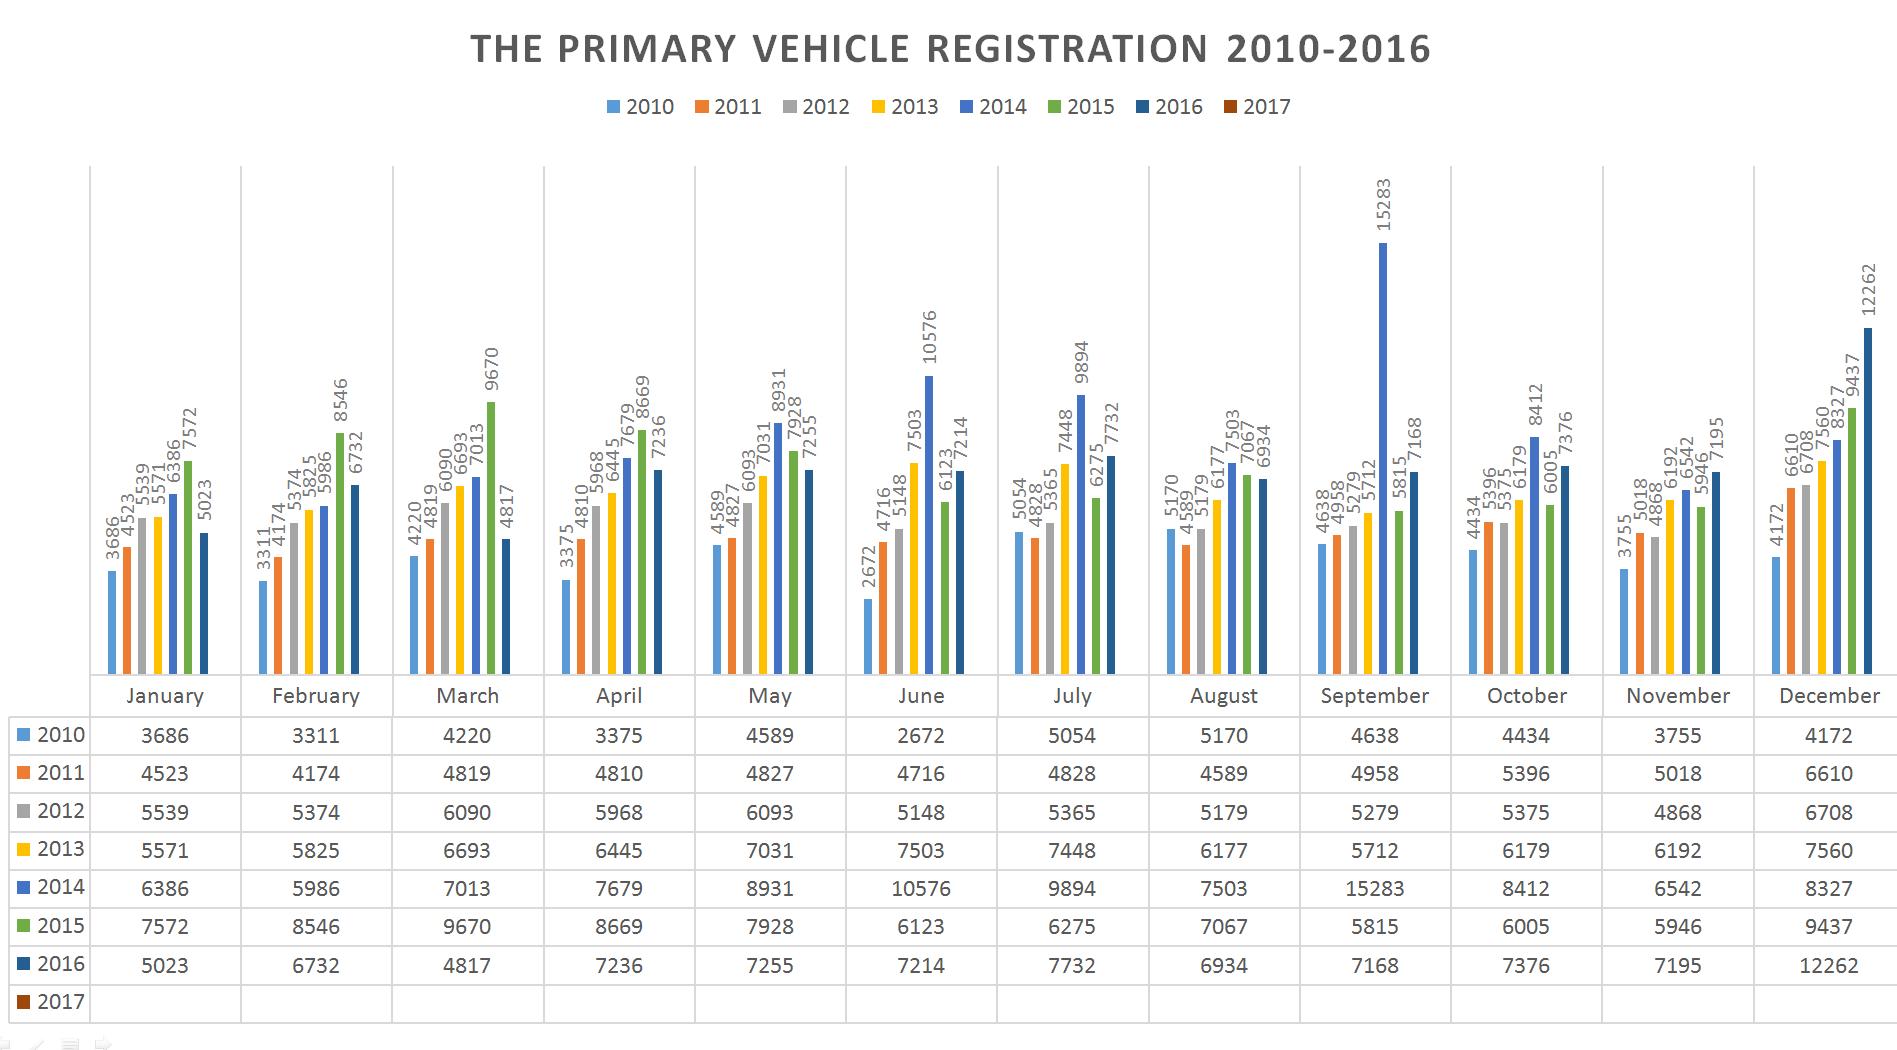 Statistics 2010-2017